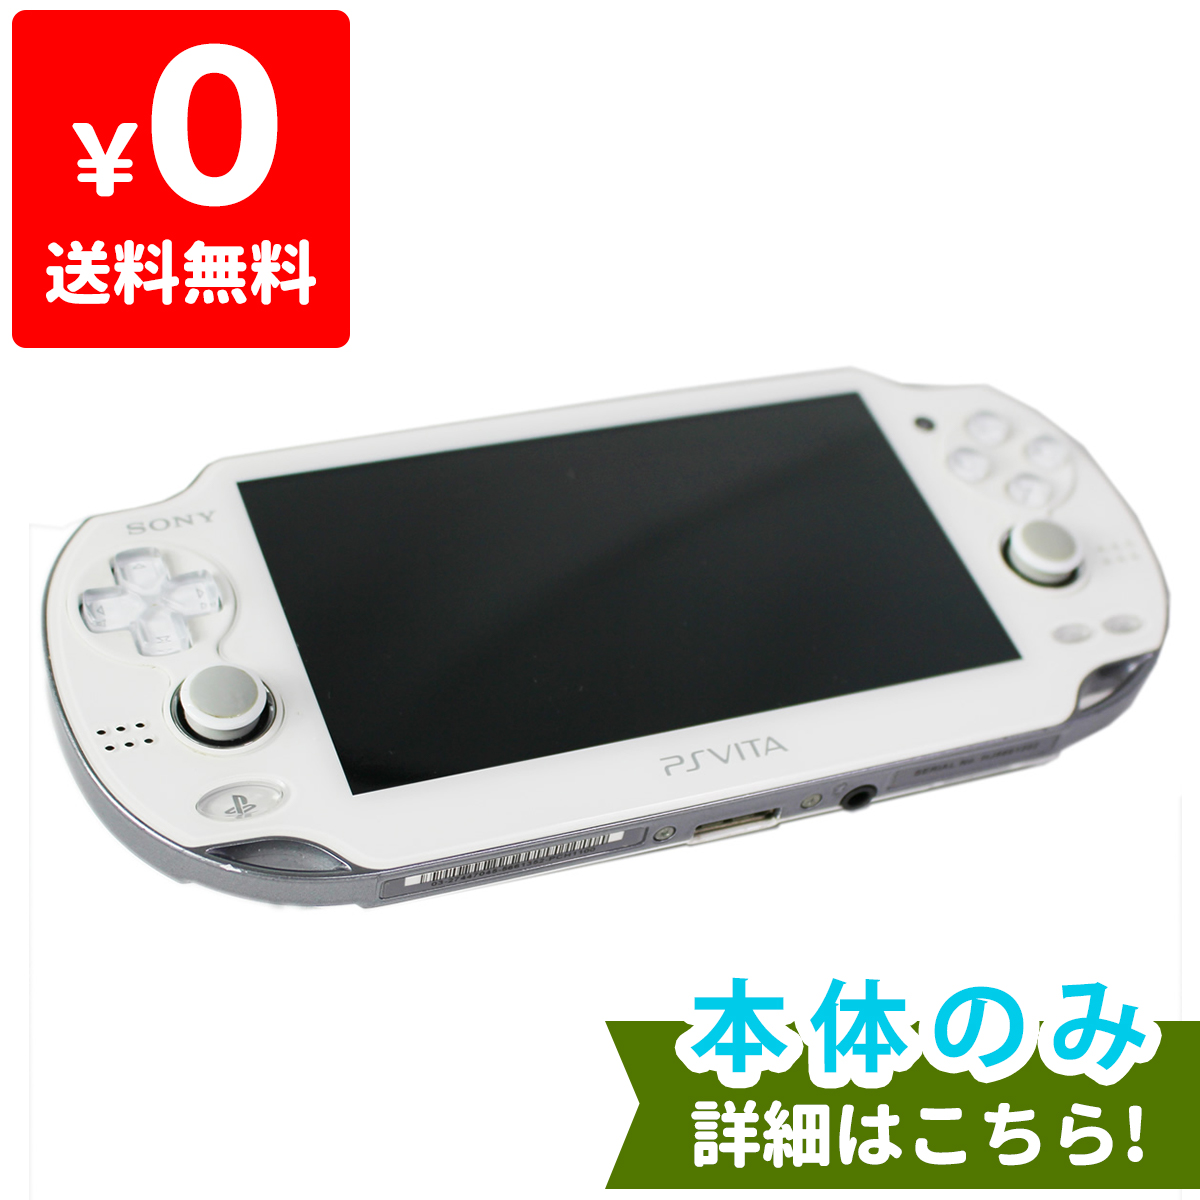 PSVita PlayStation Vita Wi‐Fiモデル クリスタル・ホワイト (PCH-1000 ZA02) 本体のみ PlayStationVita SONY ソニー 中古 4948872413268 送料無料 【中古】